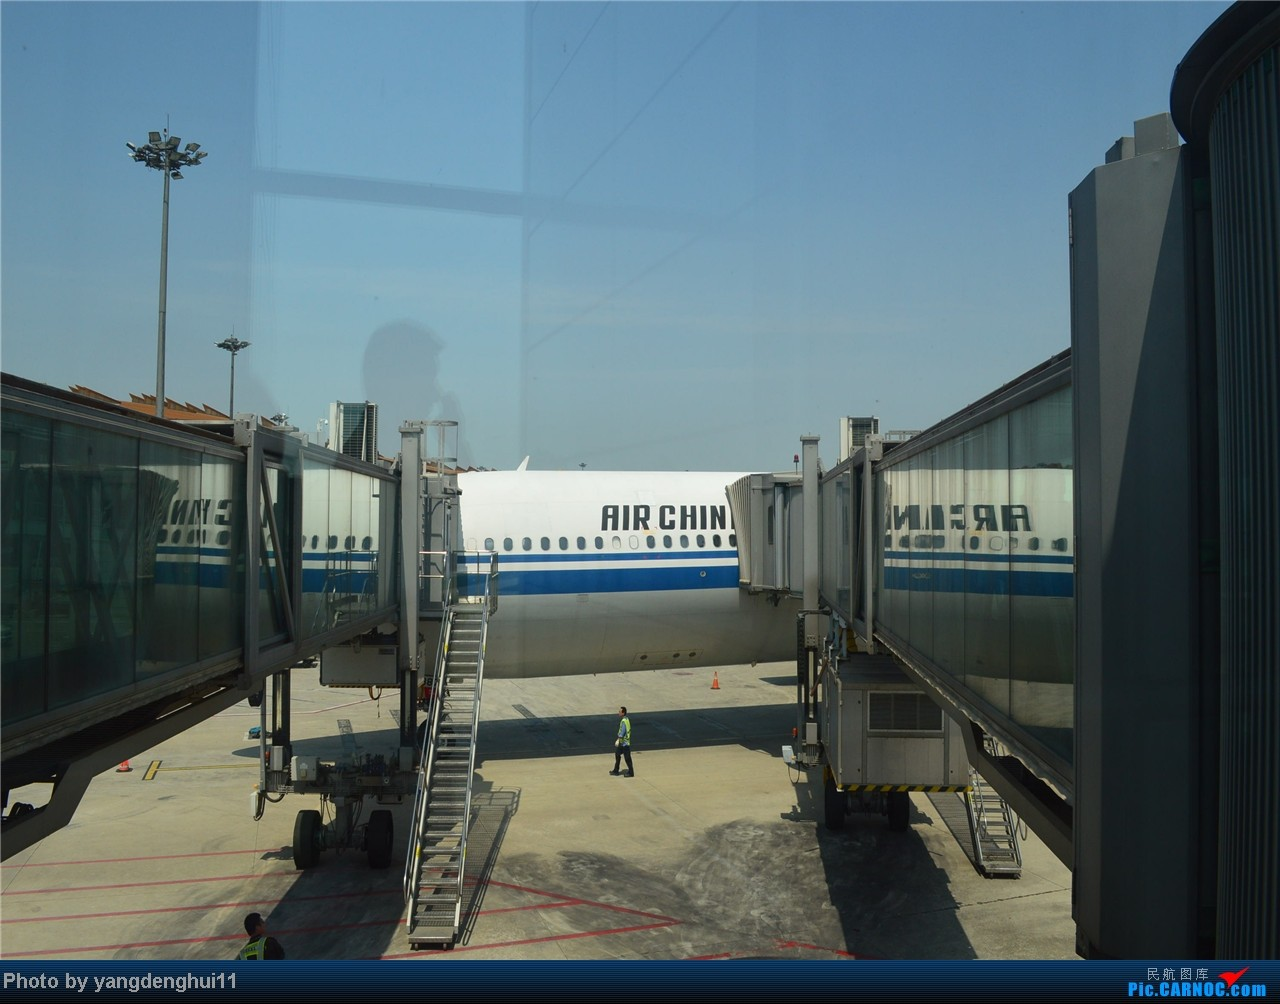 Re:[原创]暑假出游:CTU---PEK---CTU,北京巧遇国航红、蓝凤凰。(上) AIRBUS A340-300 B-2387 中国北京首都机场